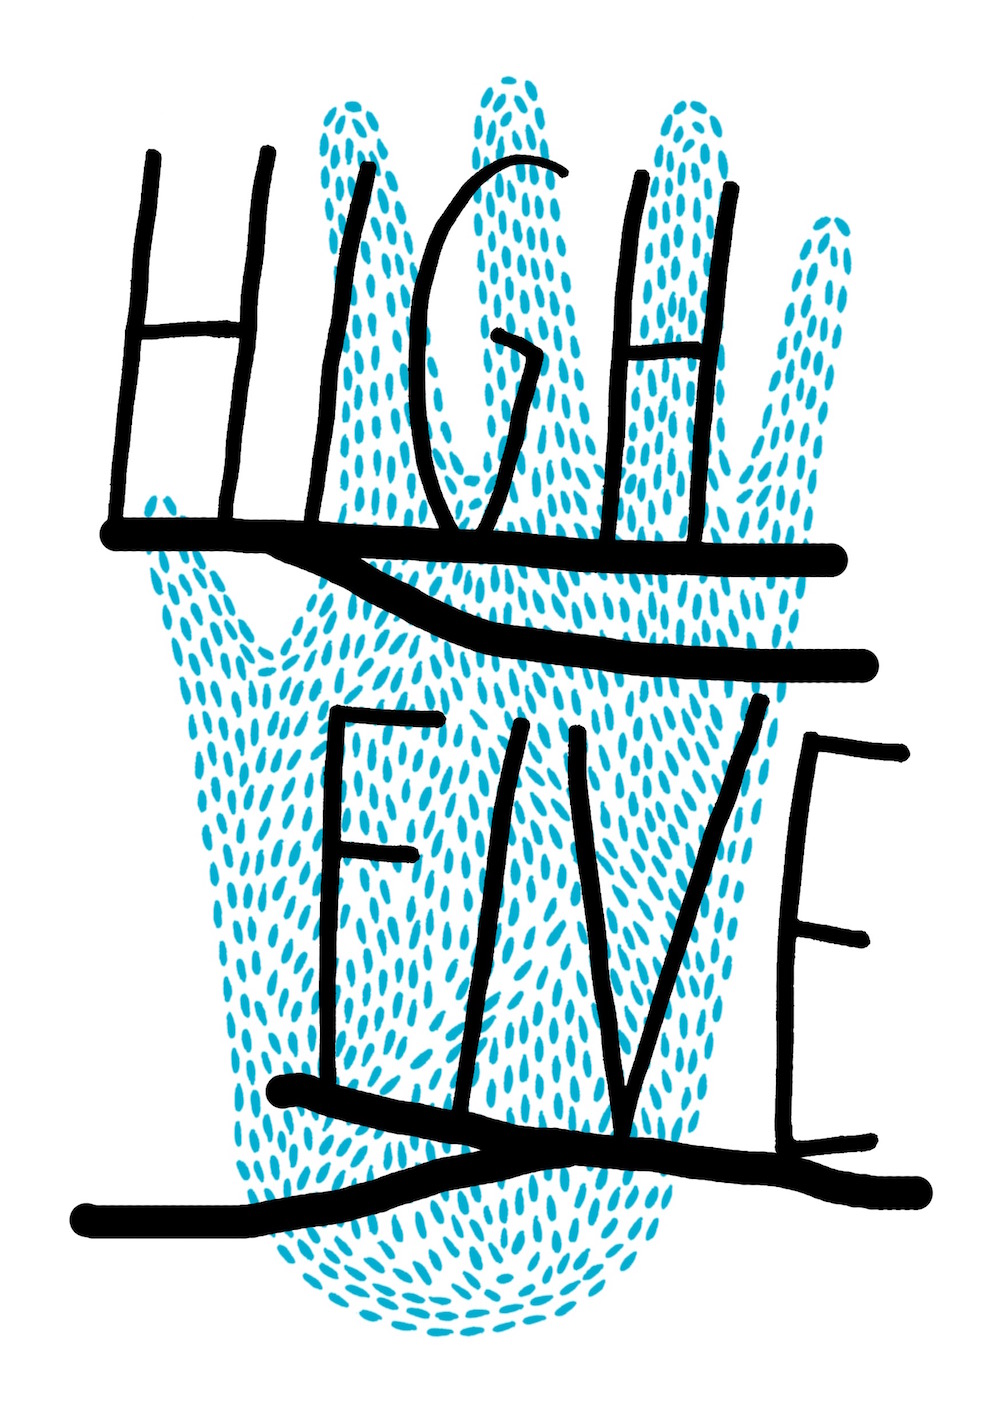 illustration, illustrations, illustrator, illustrators, hand, hands, stroke, droplets, high, five